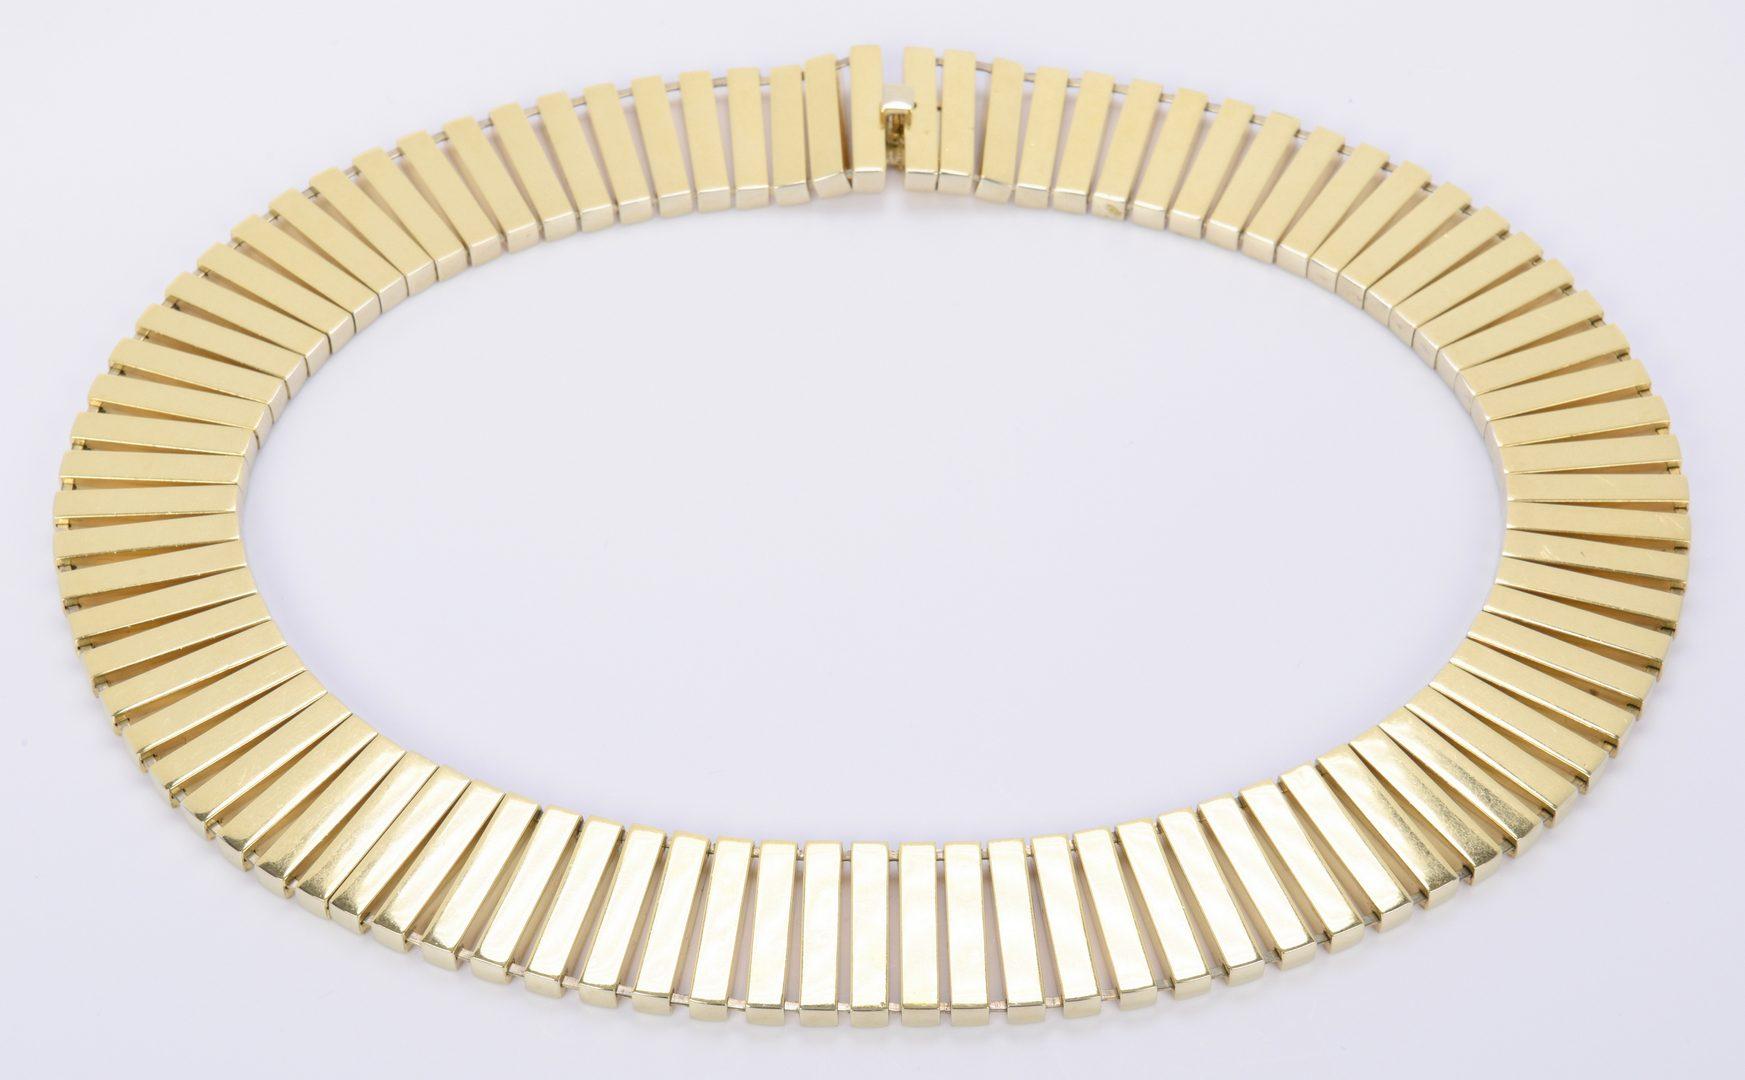 Lot 68: 18K Italian Choker Necklace, 119.7 grams